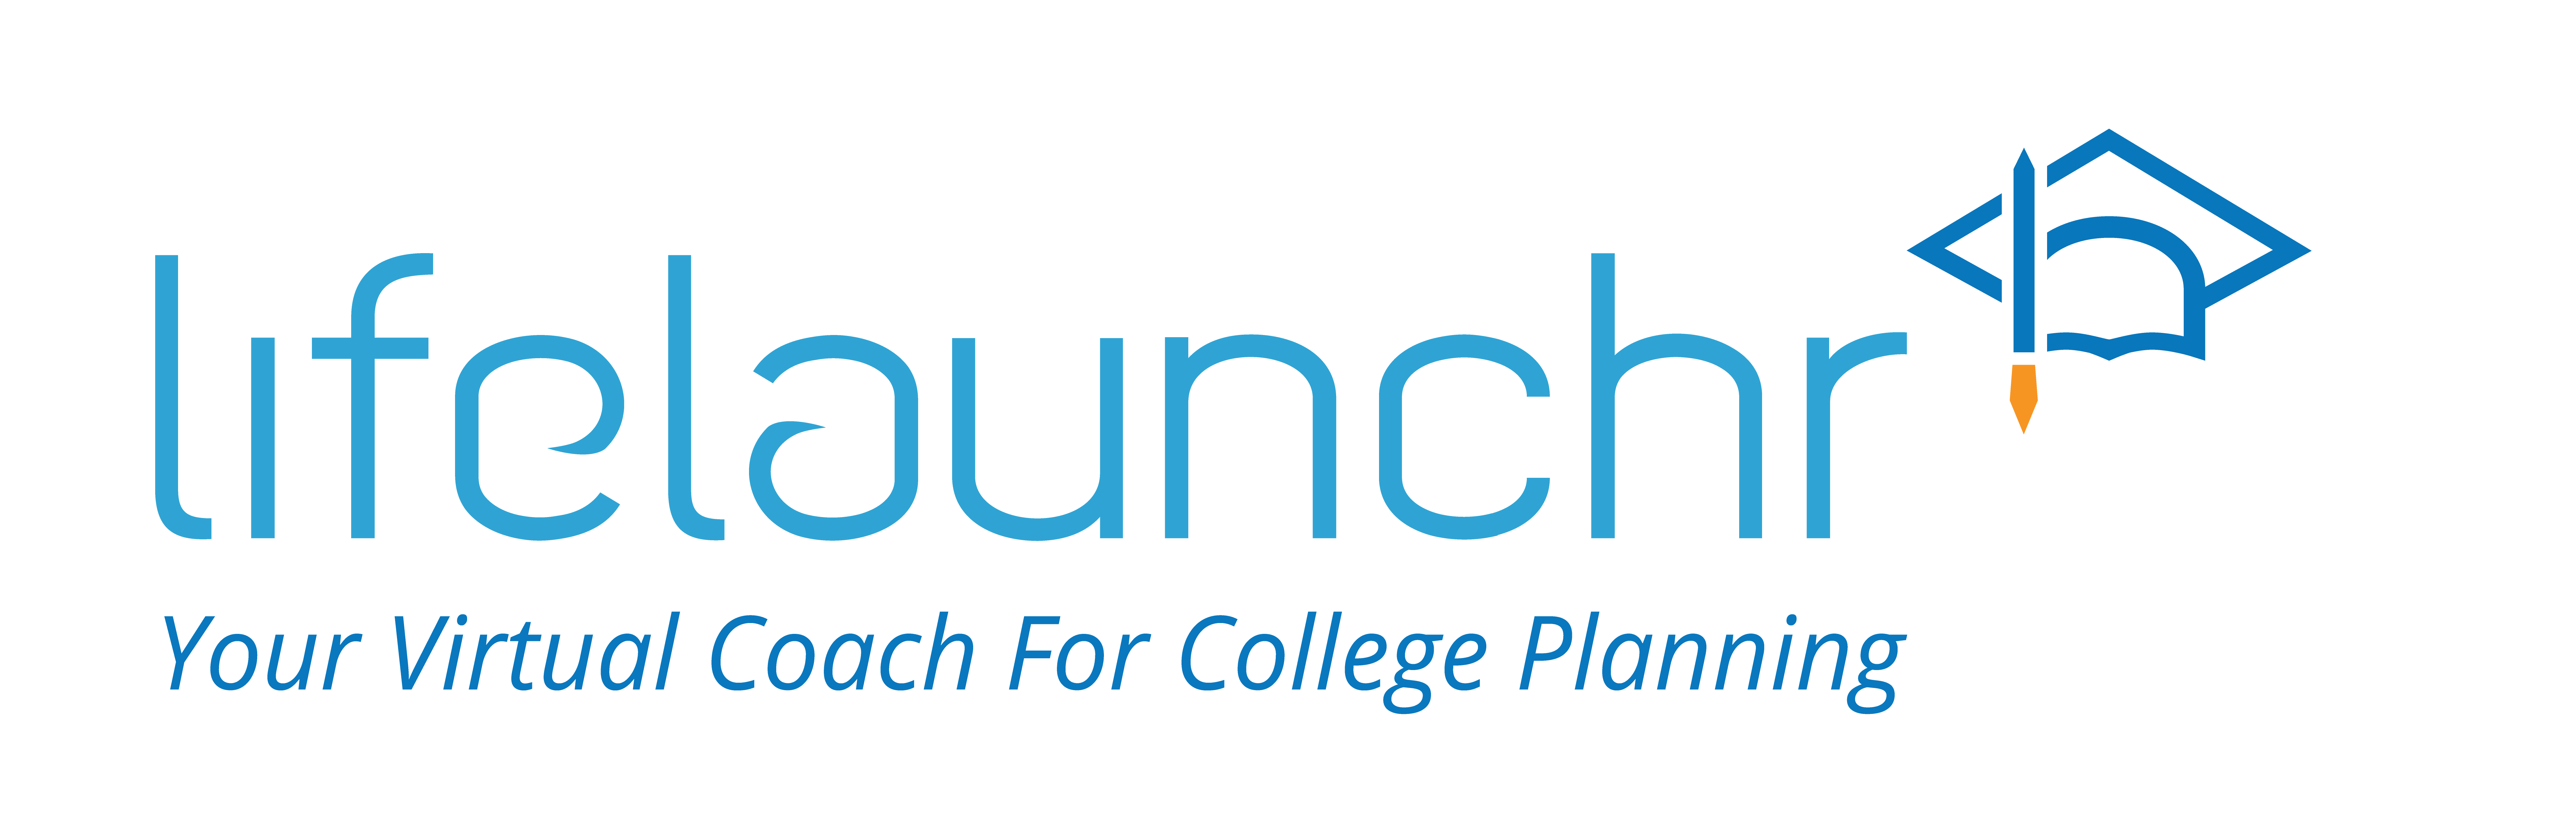 Read LifeLaunchr Reviews